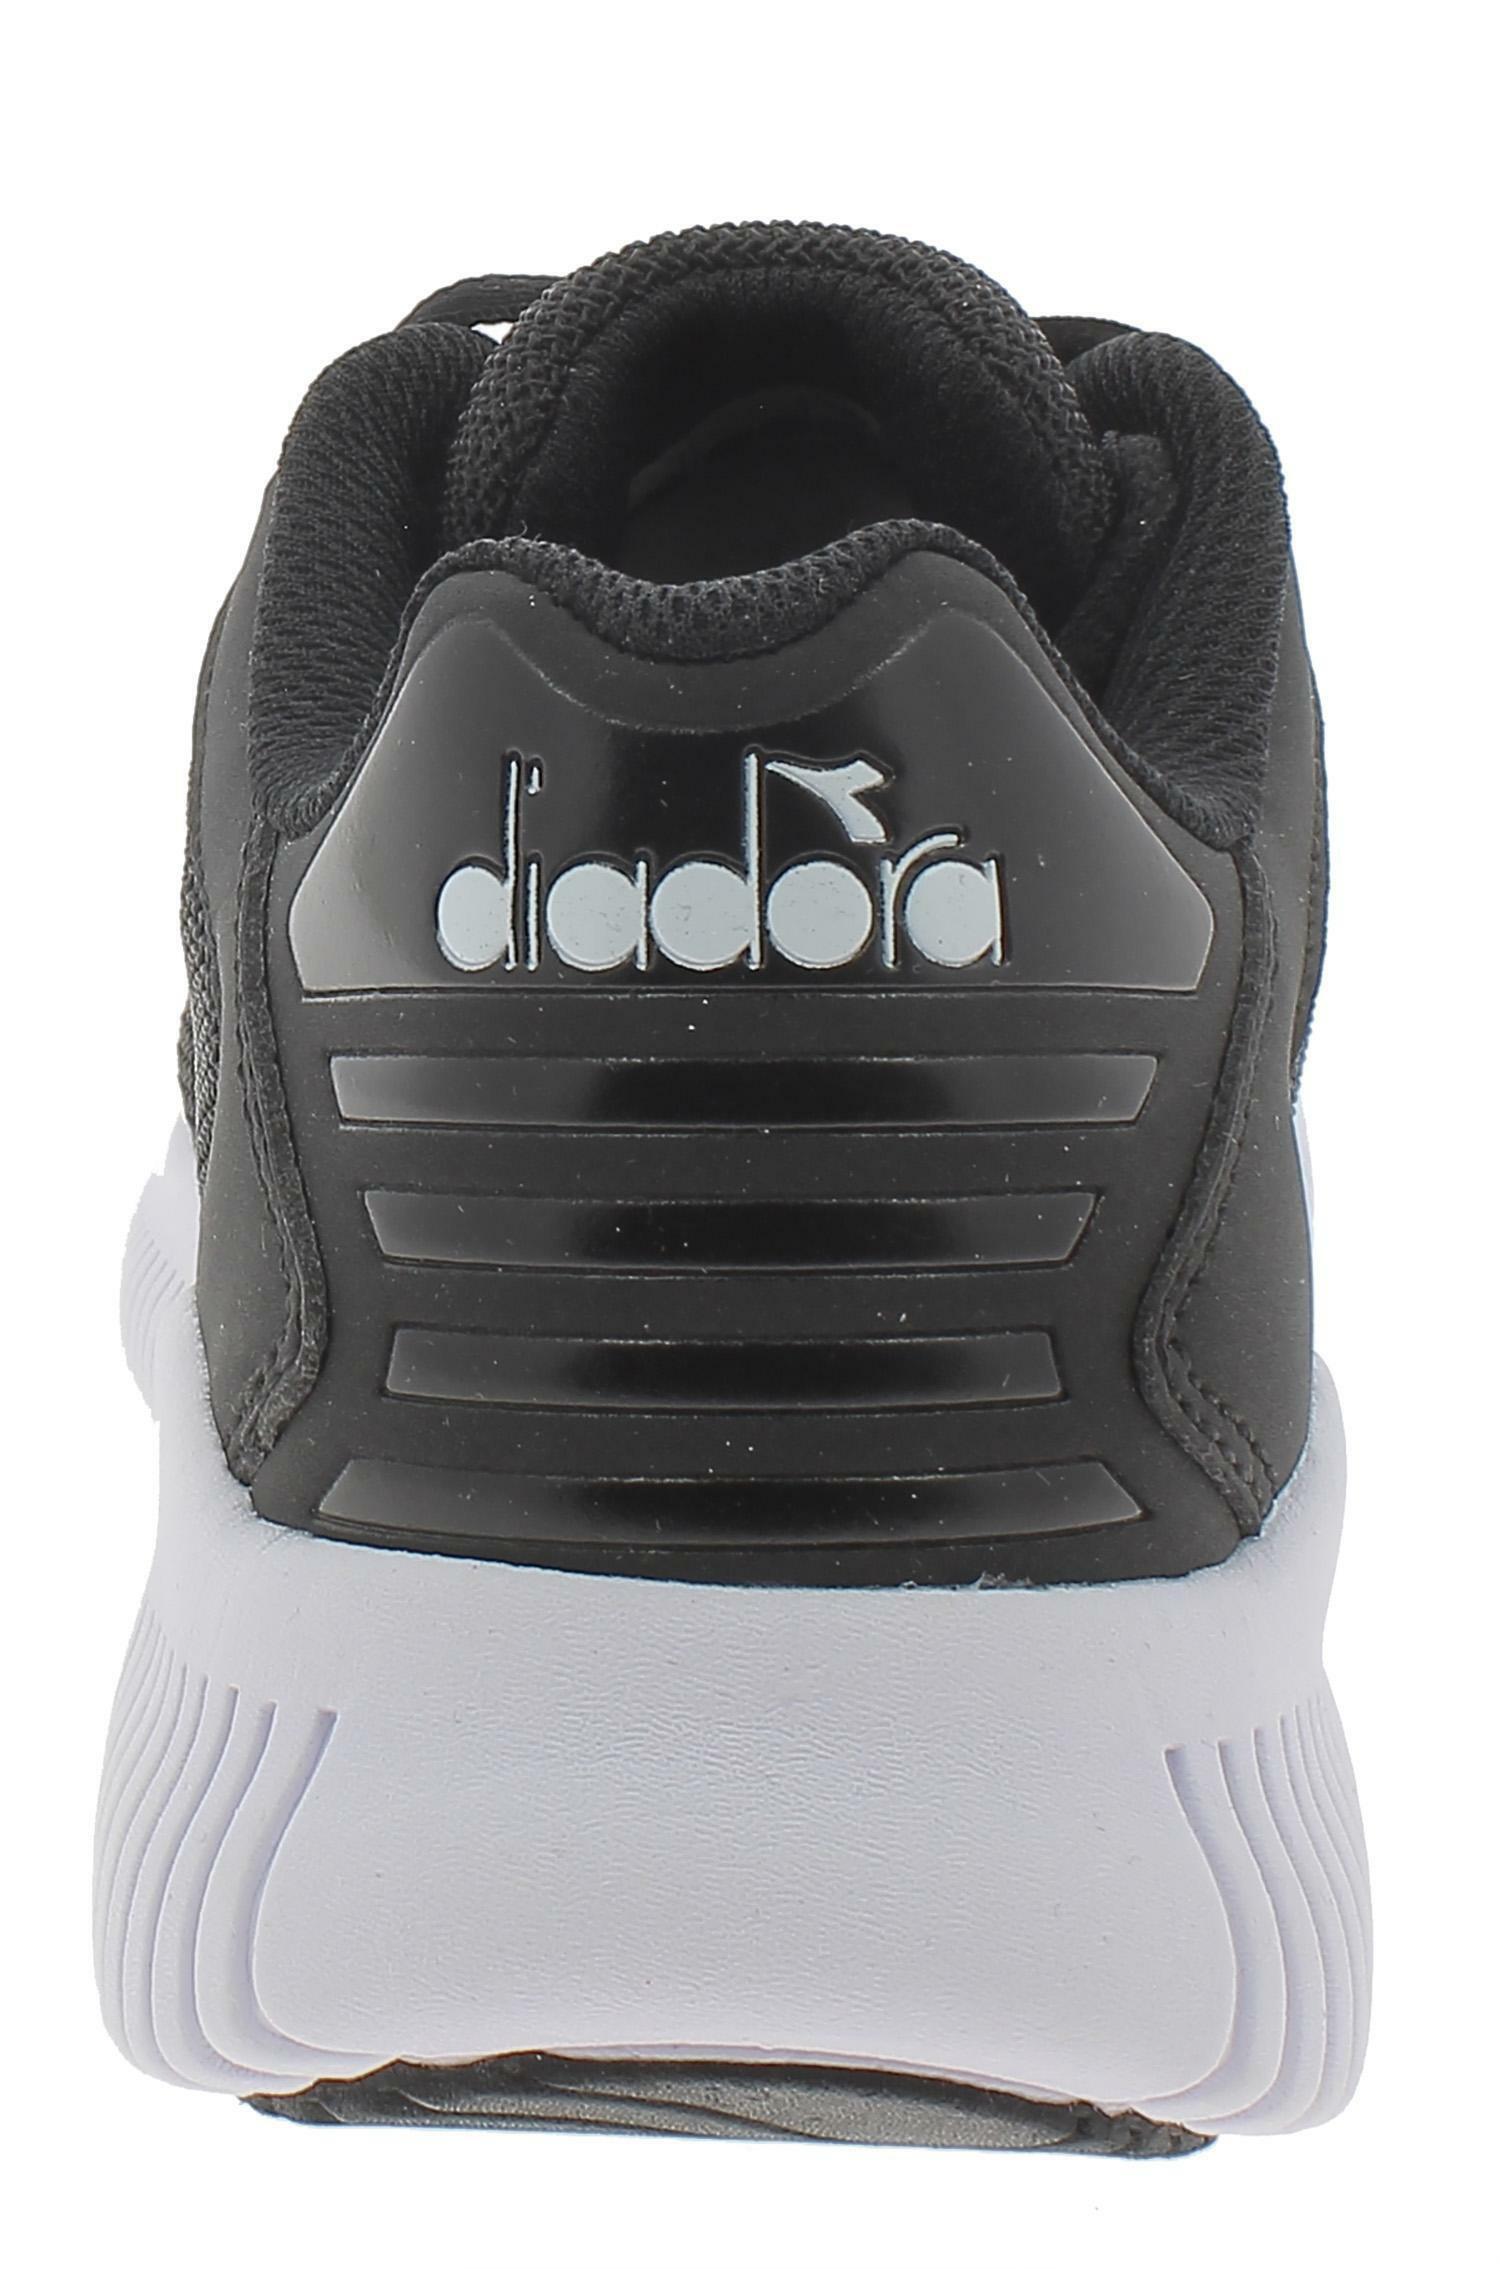 Diadora eagle 2 scarpe sportive donna nere 174896c7406